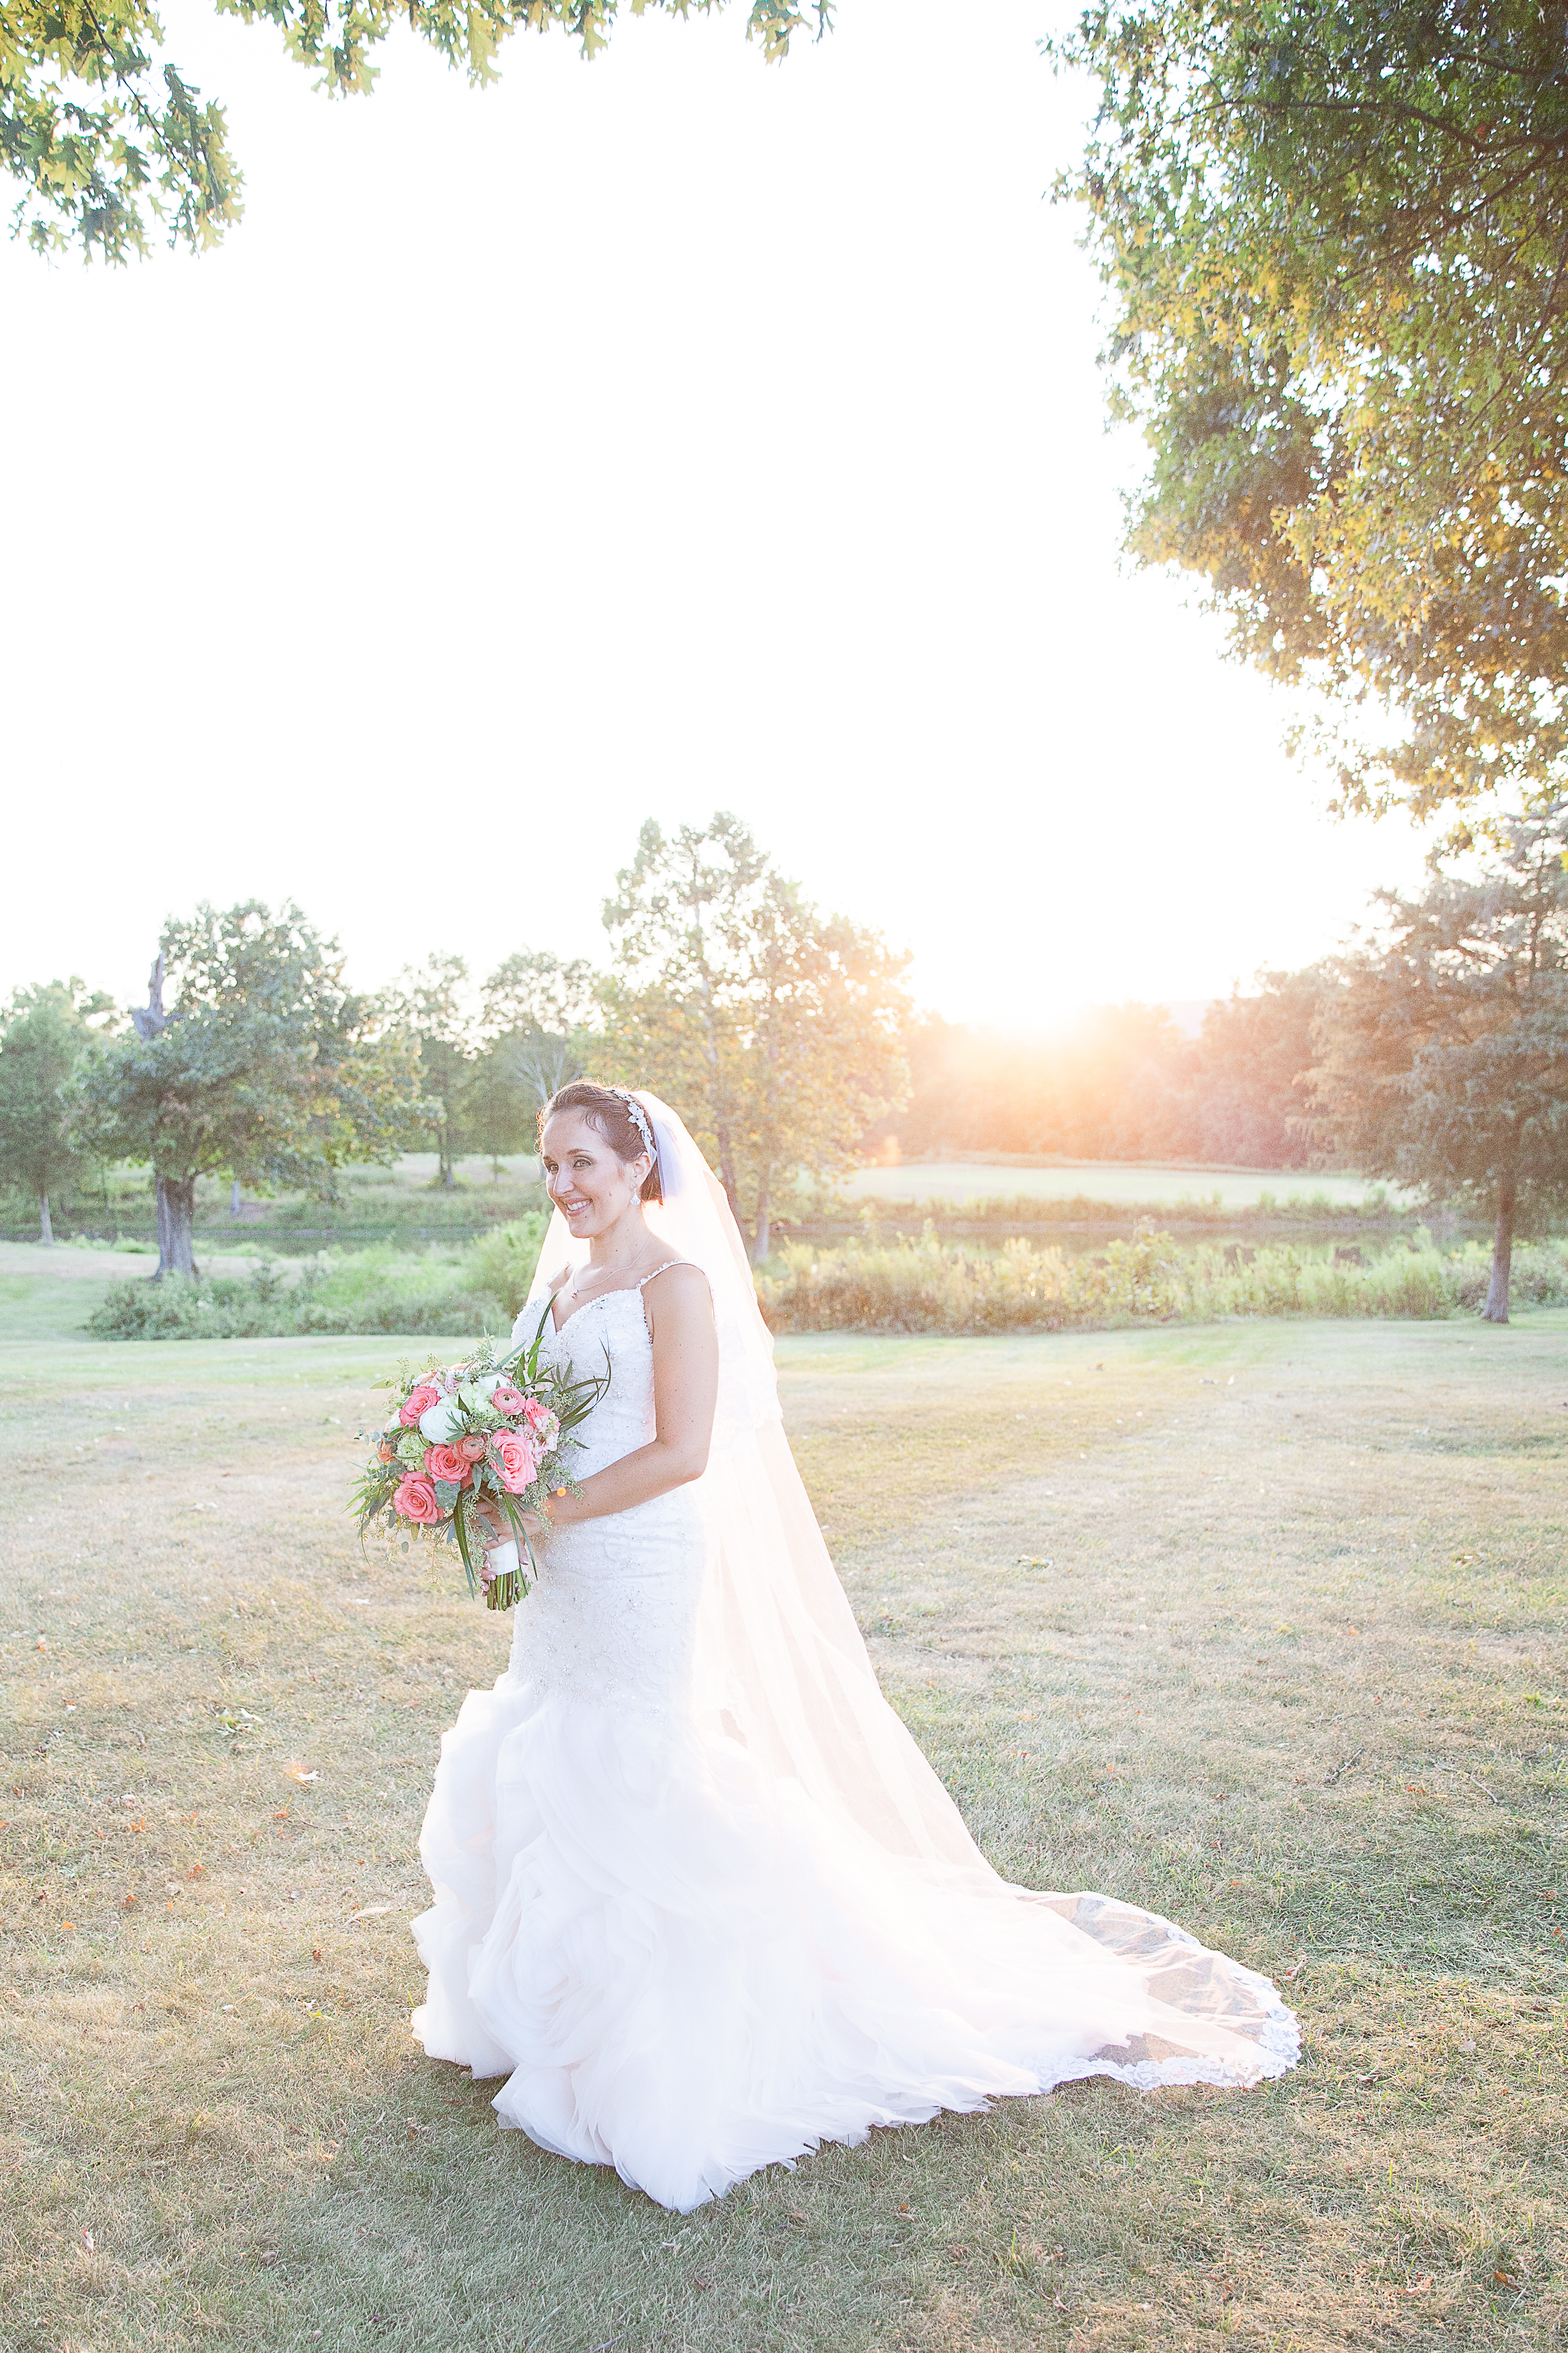 Marissa-Timon-Wedding-Kim-Pham-Clark-Photography-17.jpg